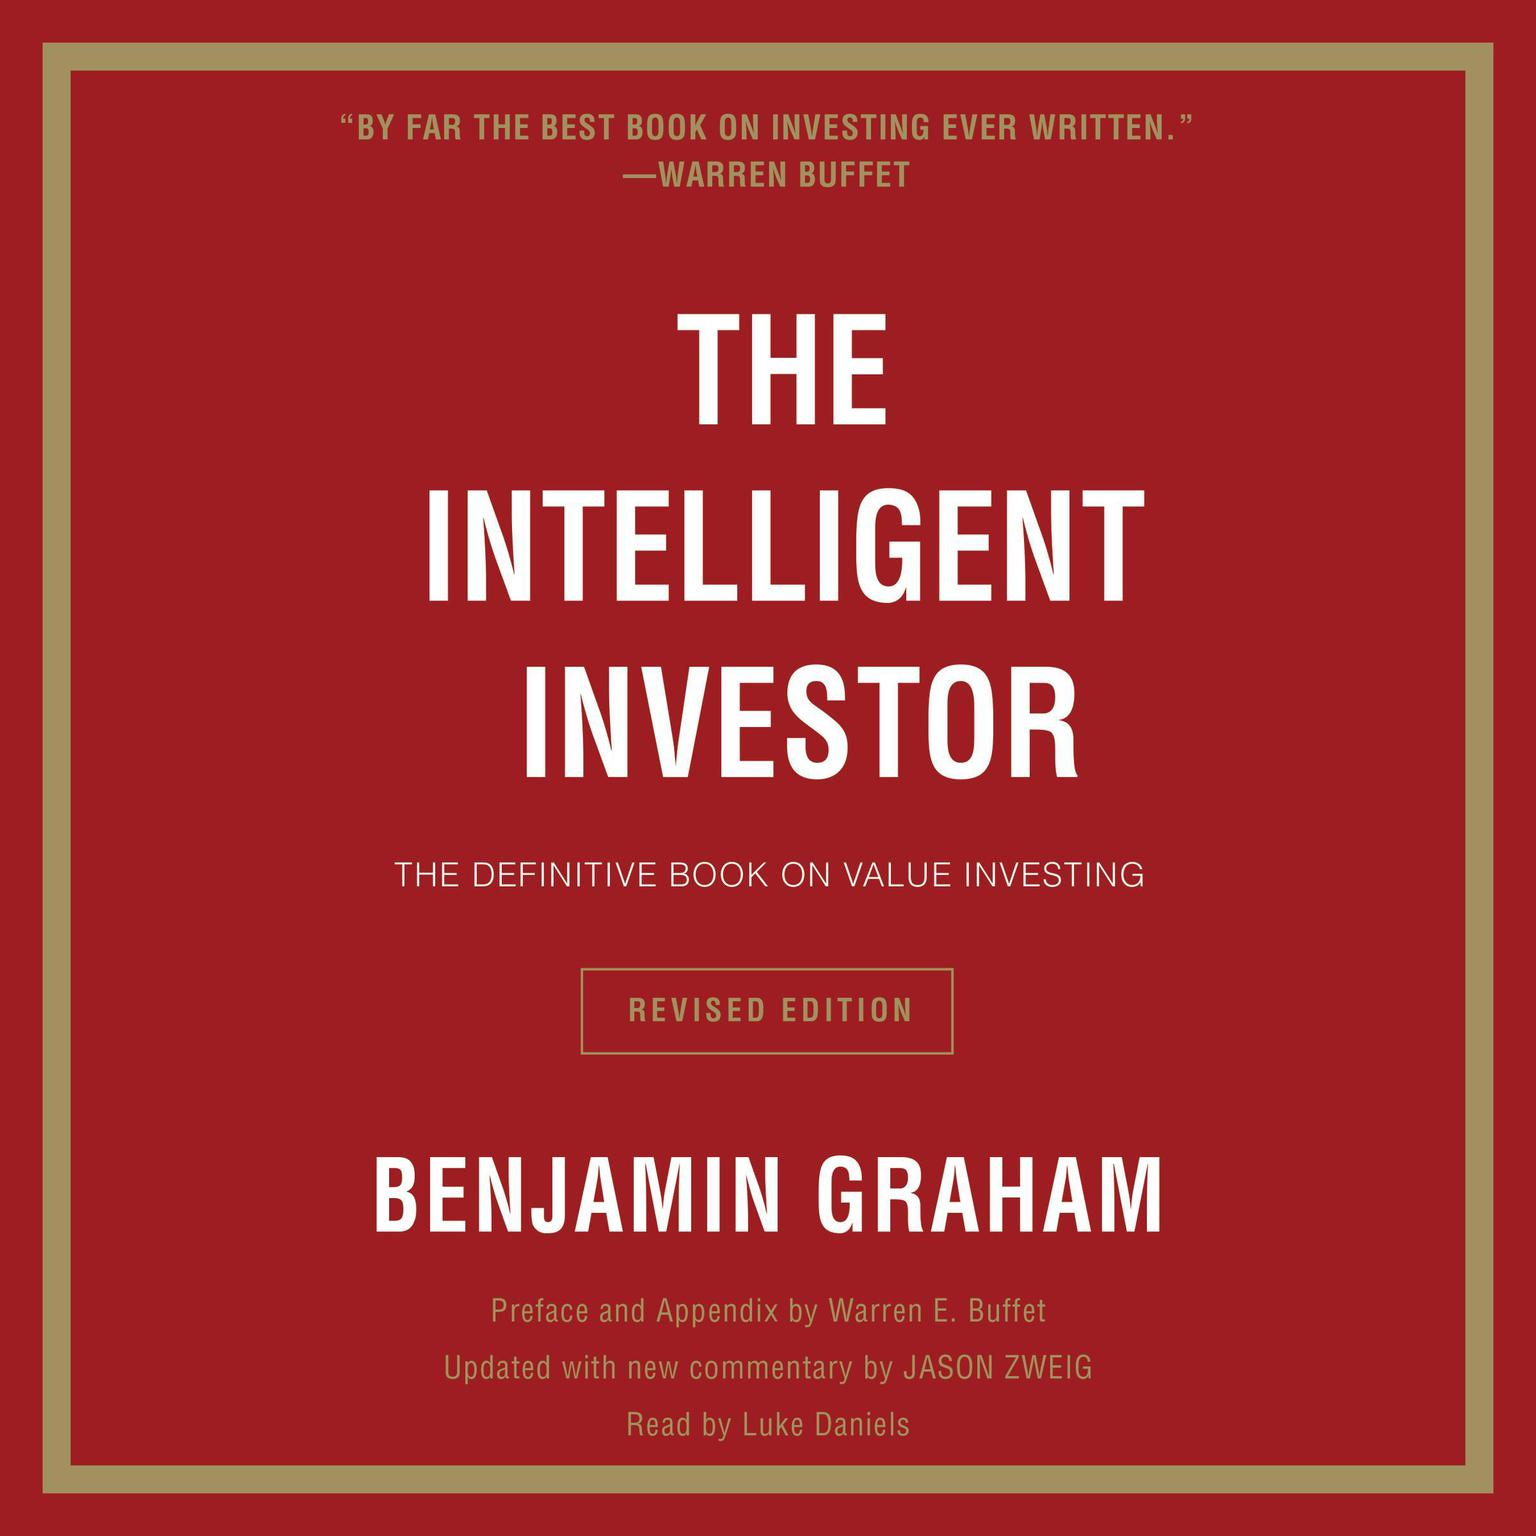 The Intelligent Investor Rev Ed. Audiobook, by Benjamin Graham